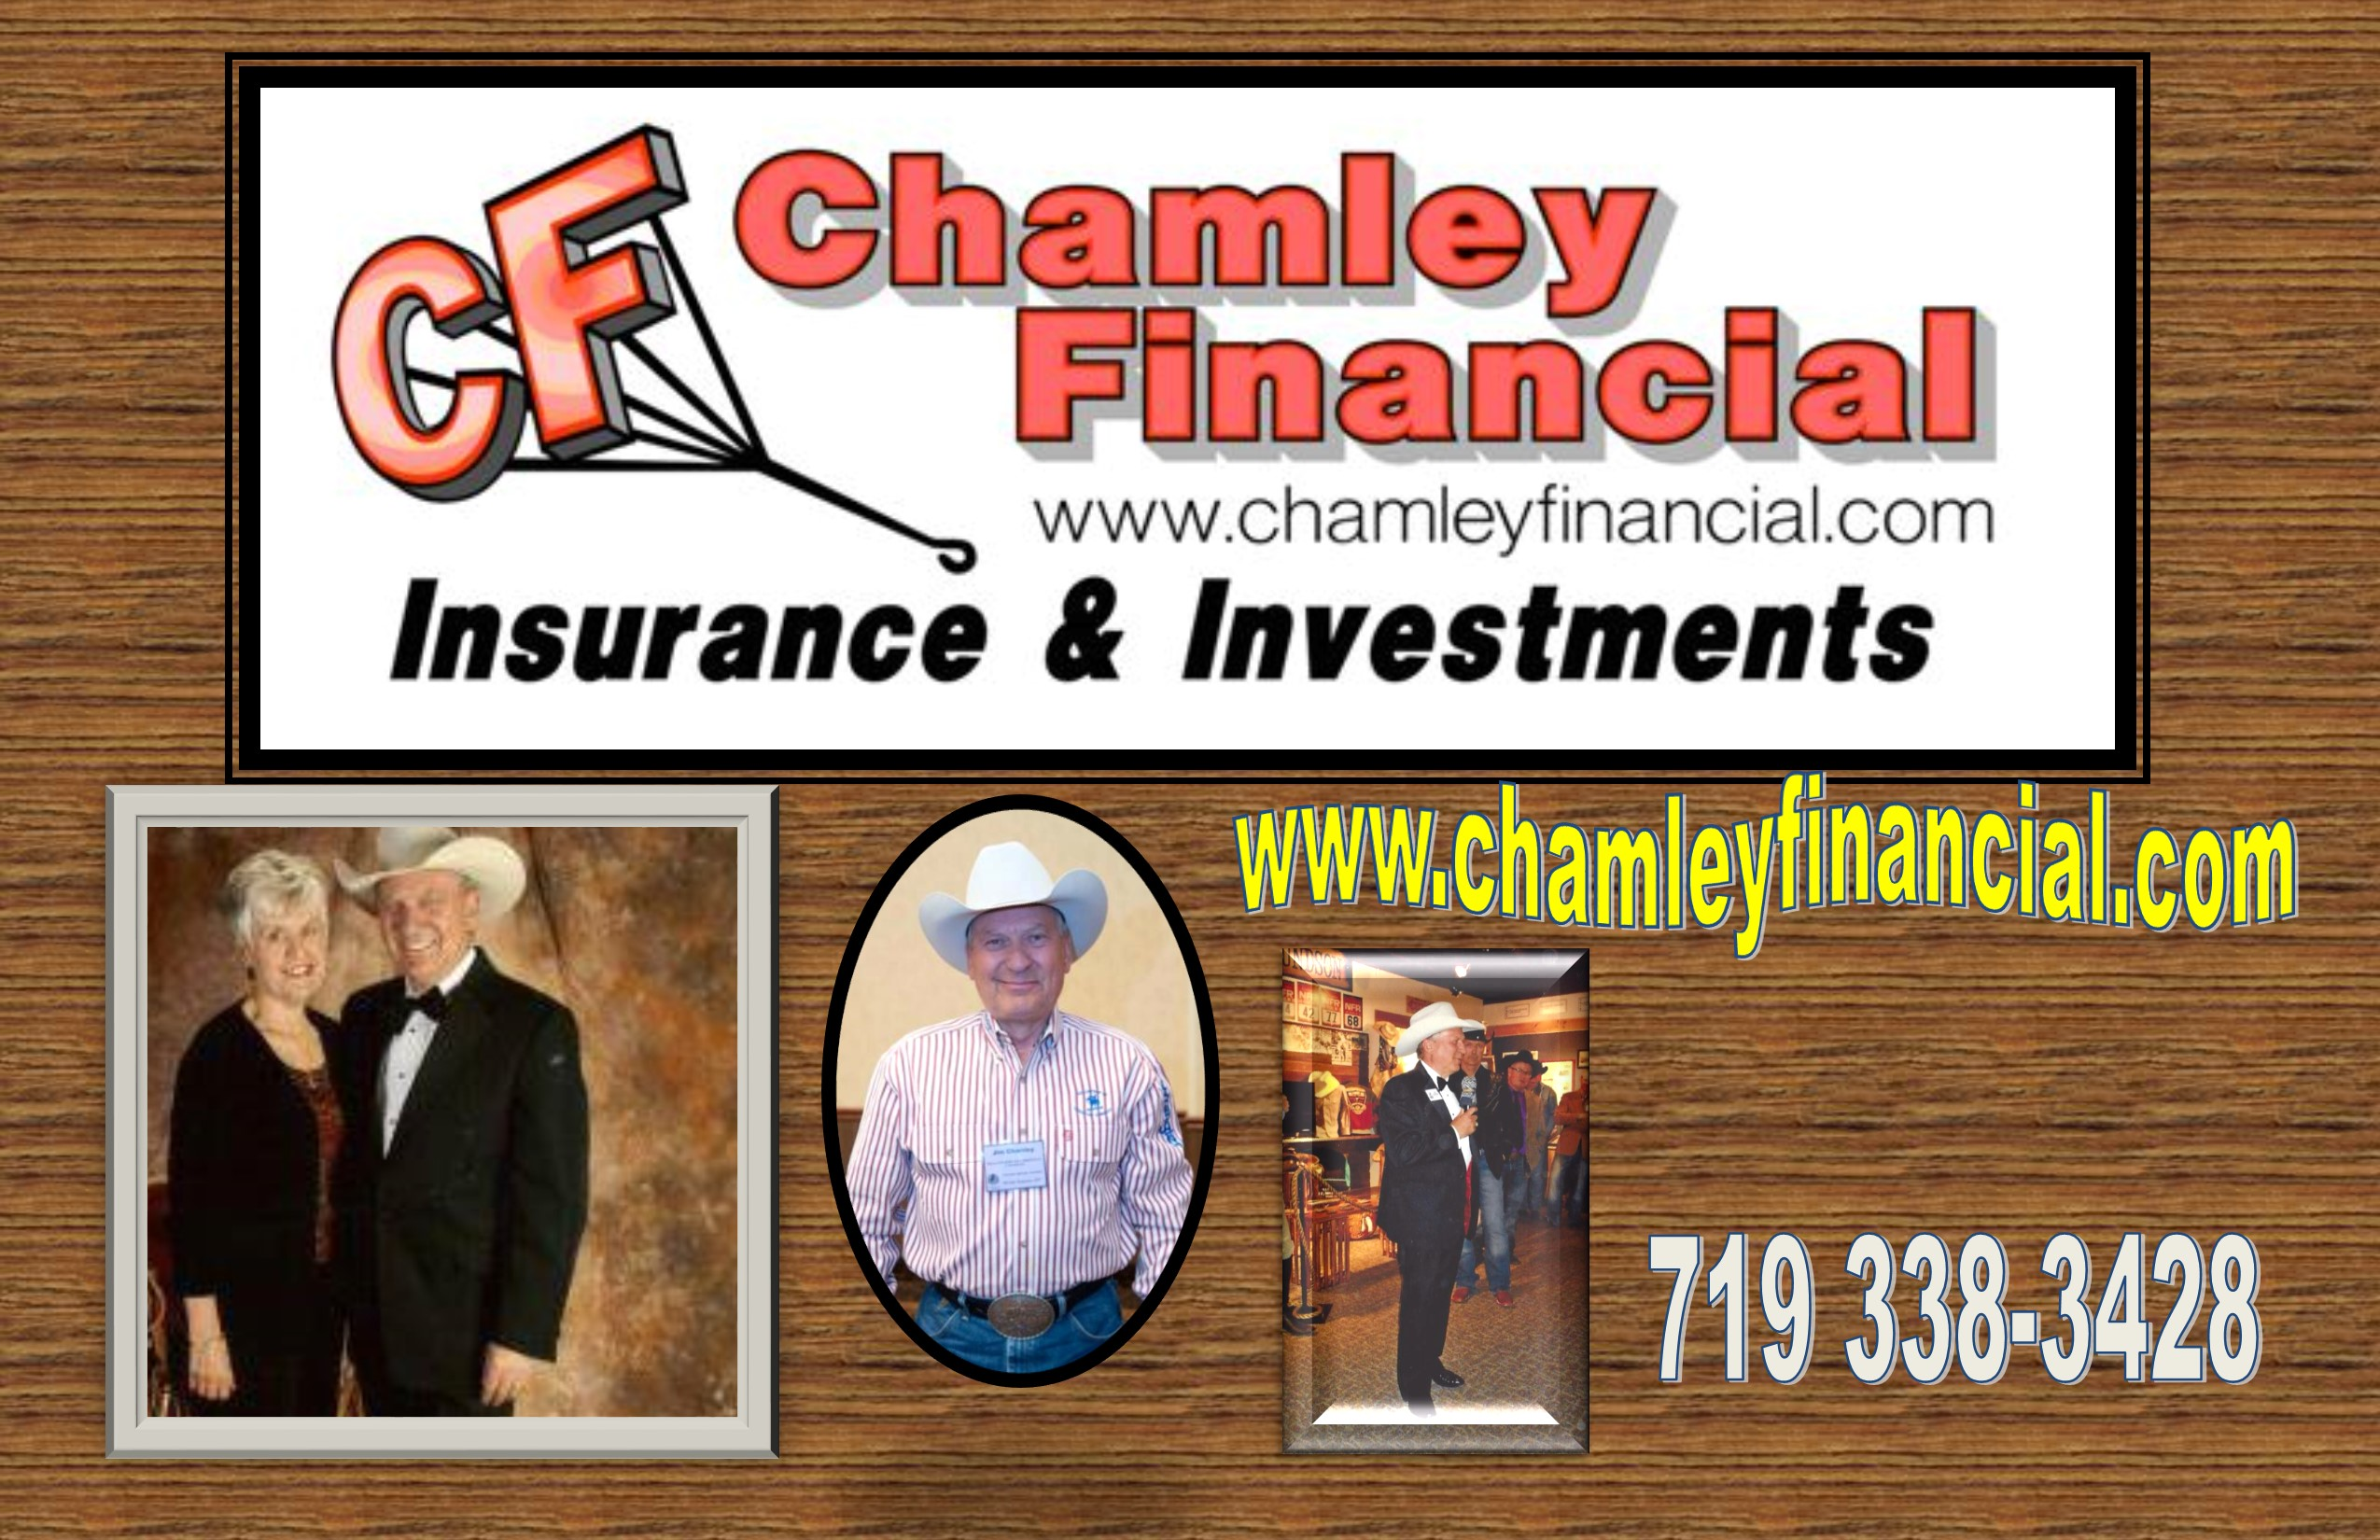 Chamley Financial